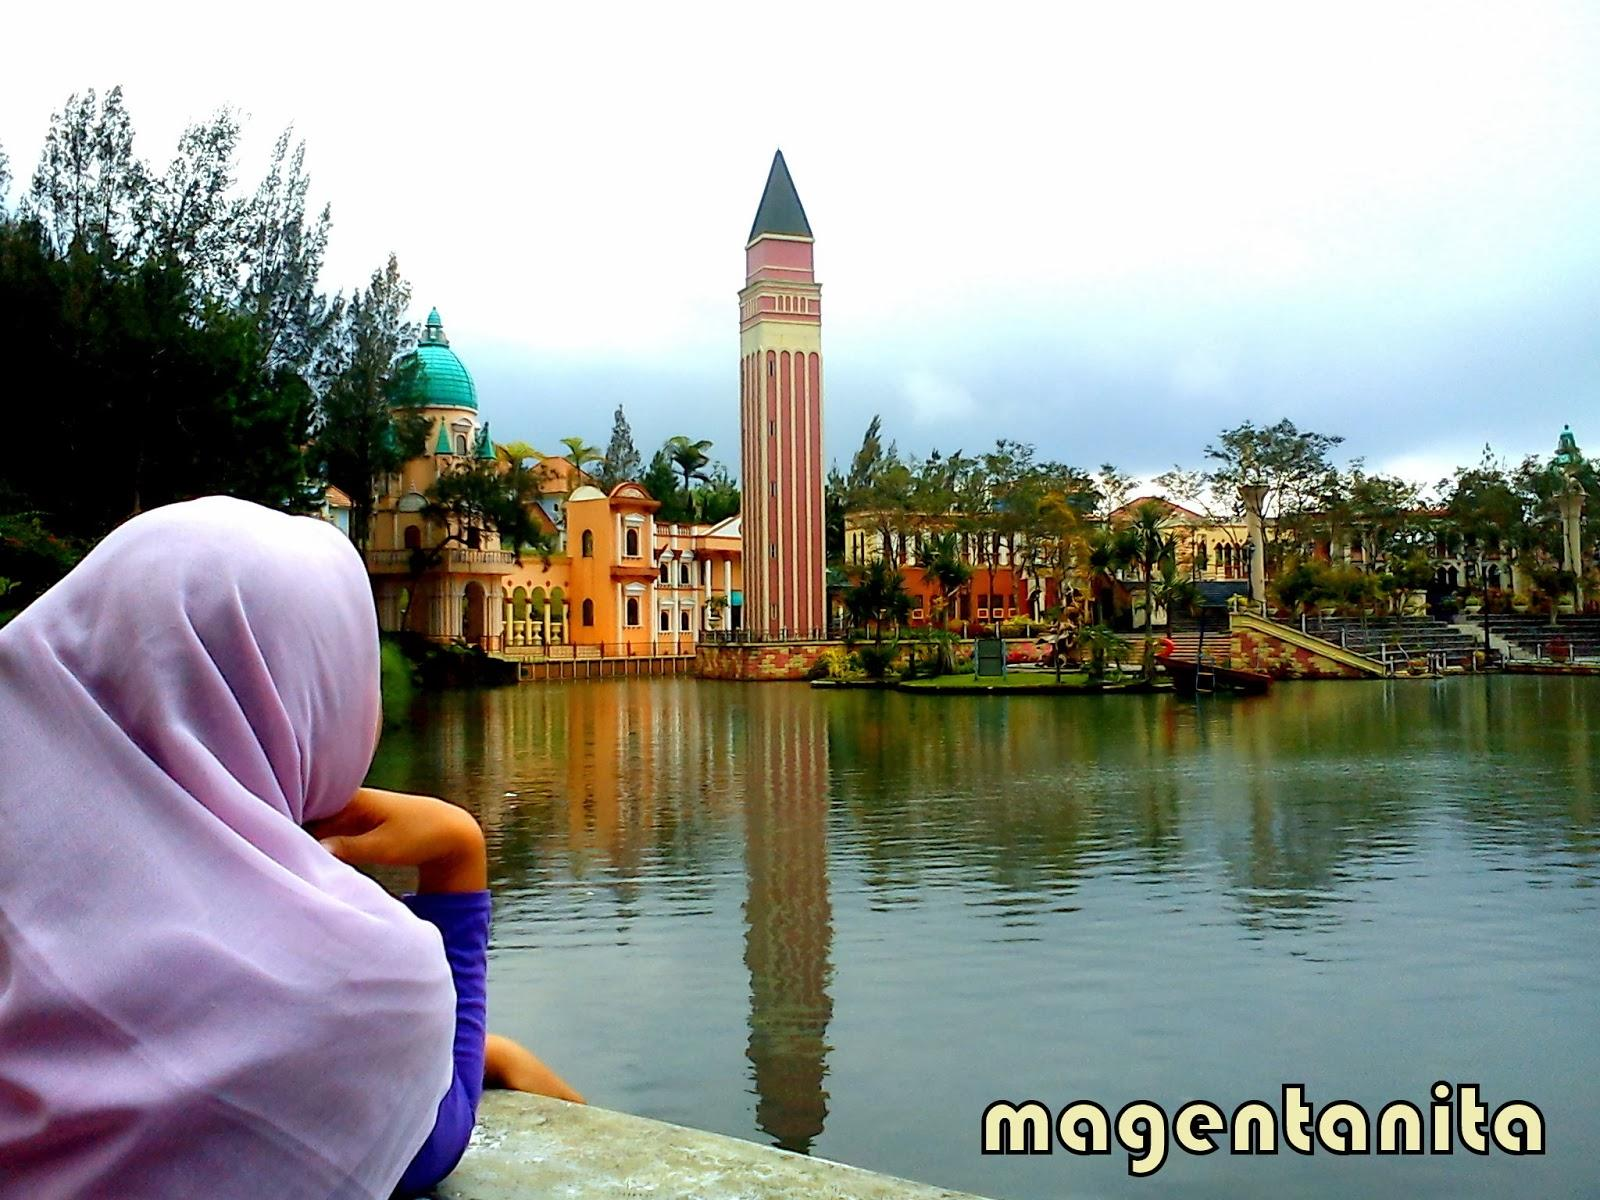 Berwisata Keluarga Wisata Little Venice Kota Bunga Puncak Bogor